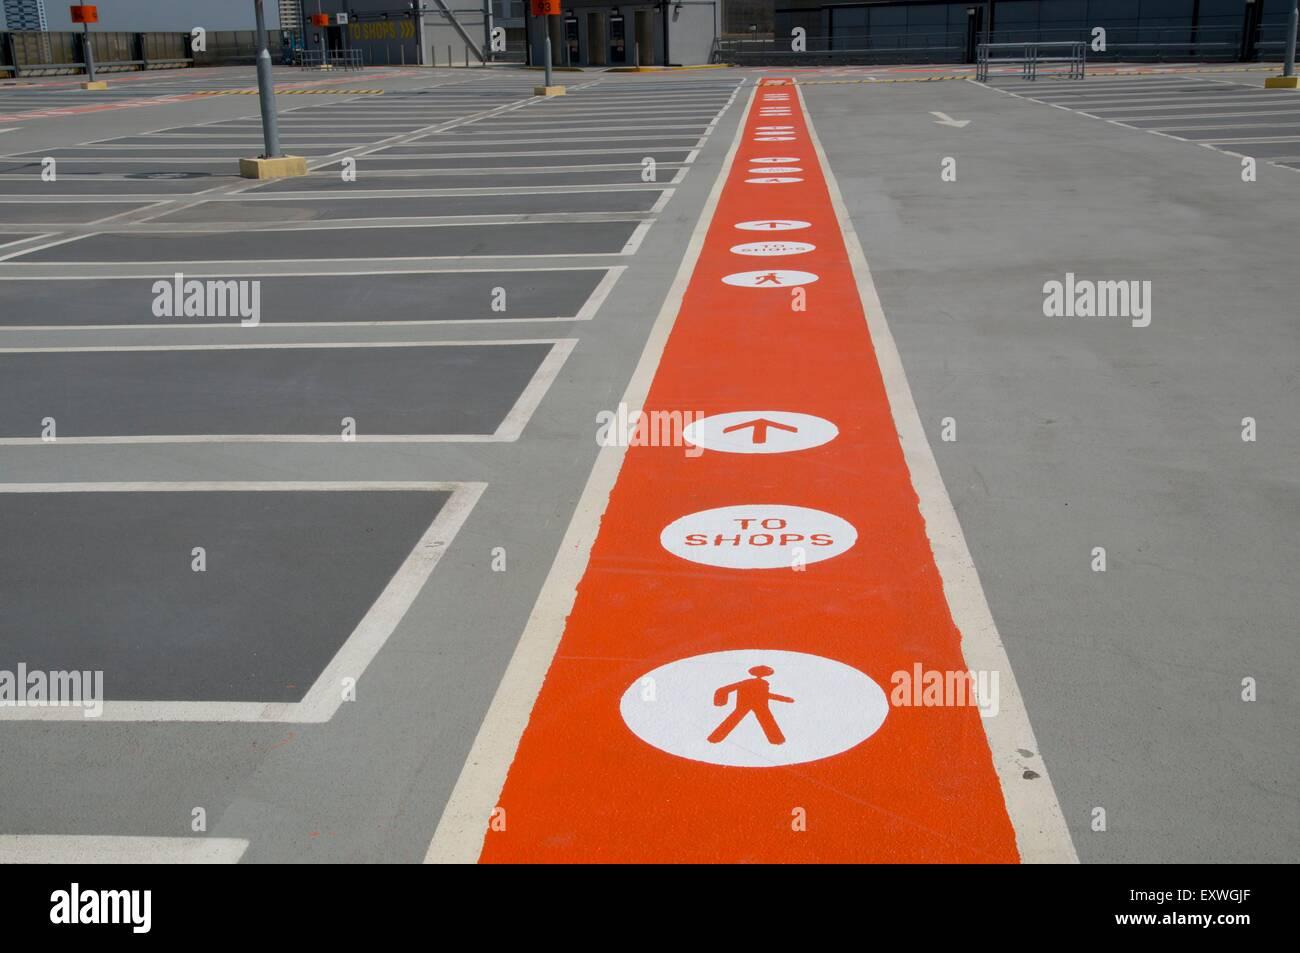 Multistorey parking at Stratford Center shopping mall, London, UK - Stock Image